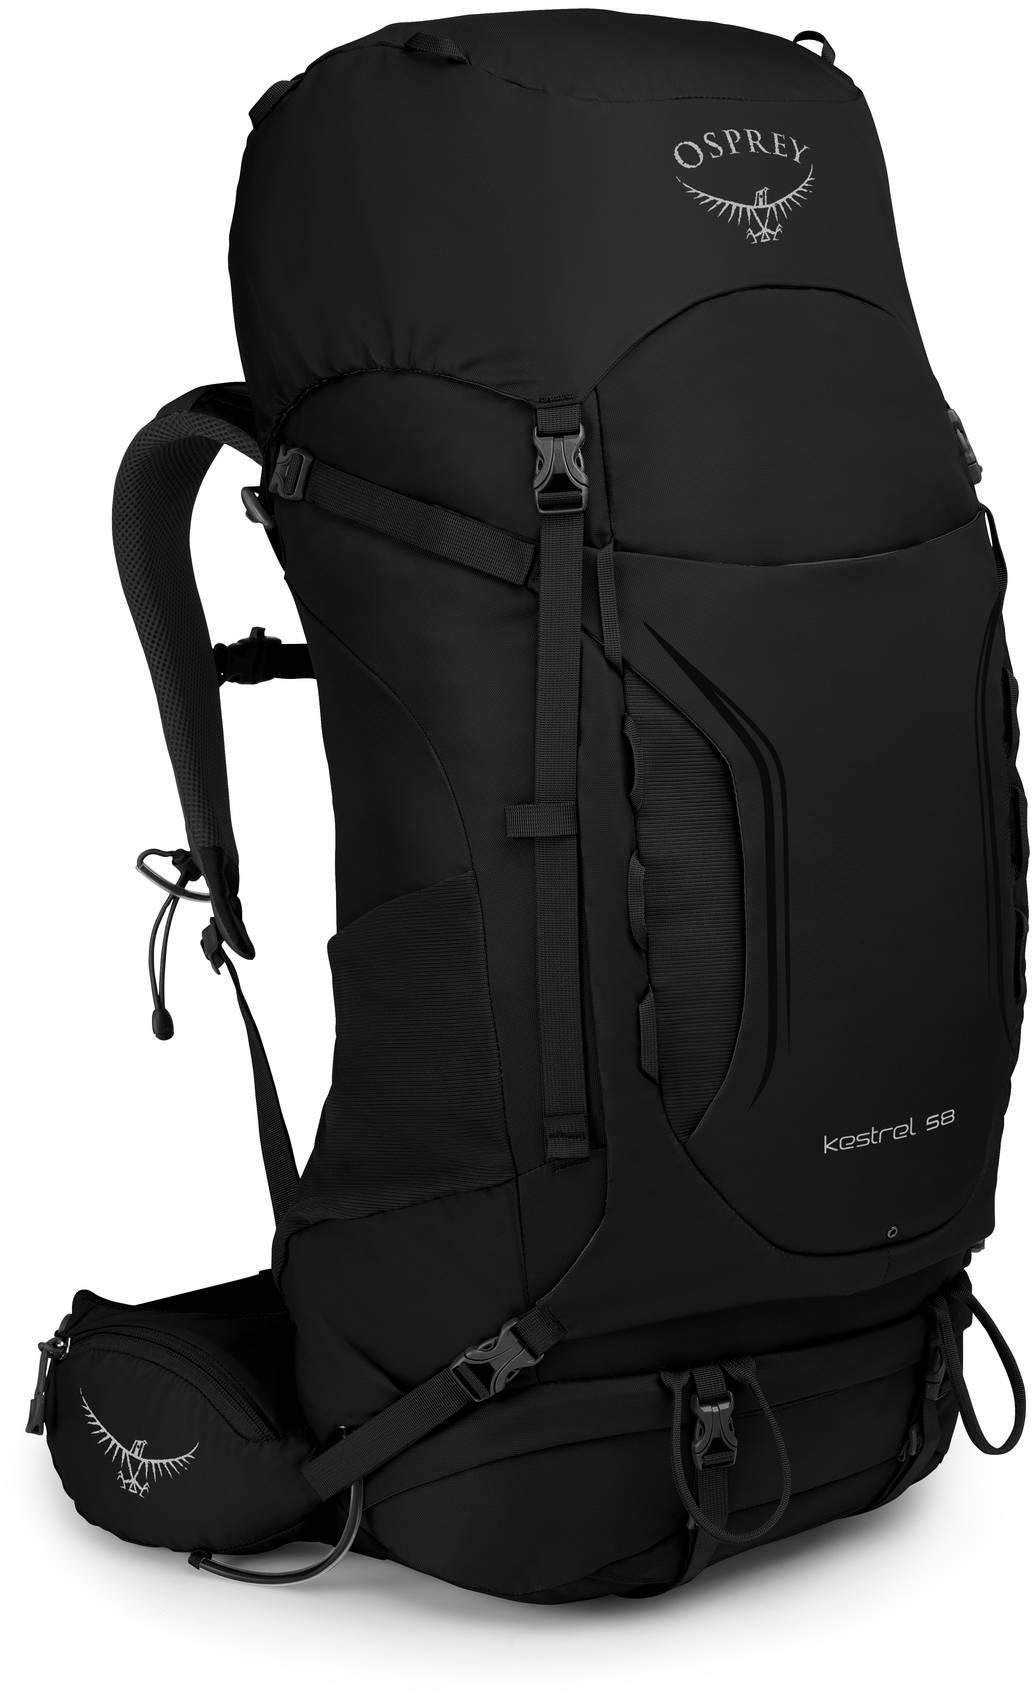 Kestrel Рюкзак туристический Osprey Kestrel 68 Black Kestrel_58_S19_Side_Black_web.jpg